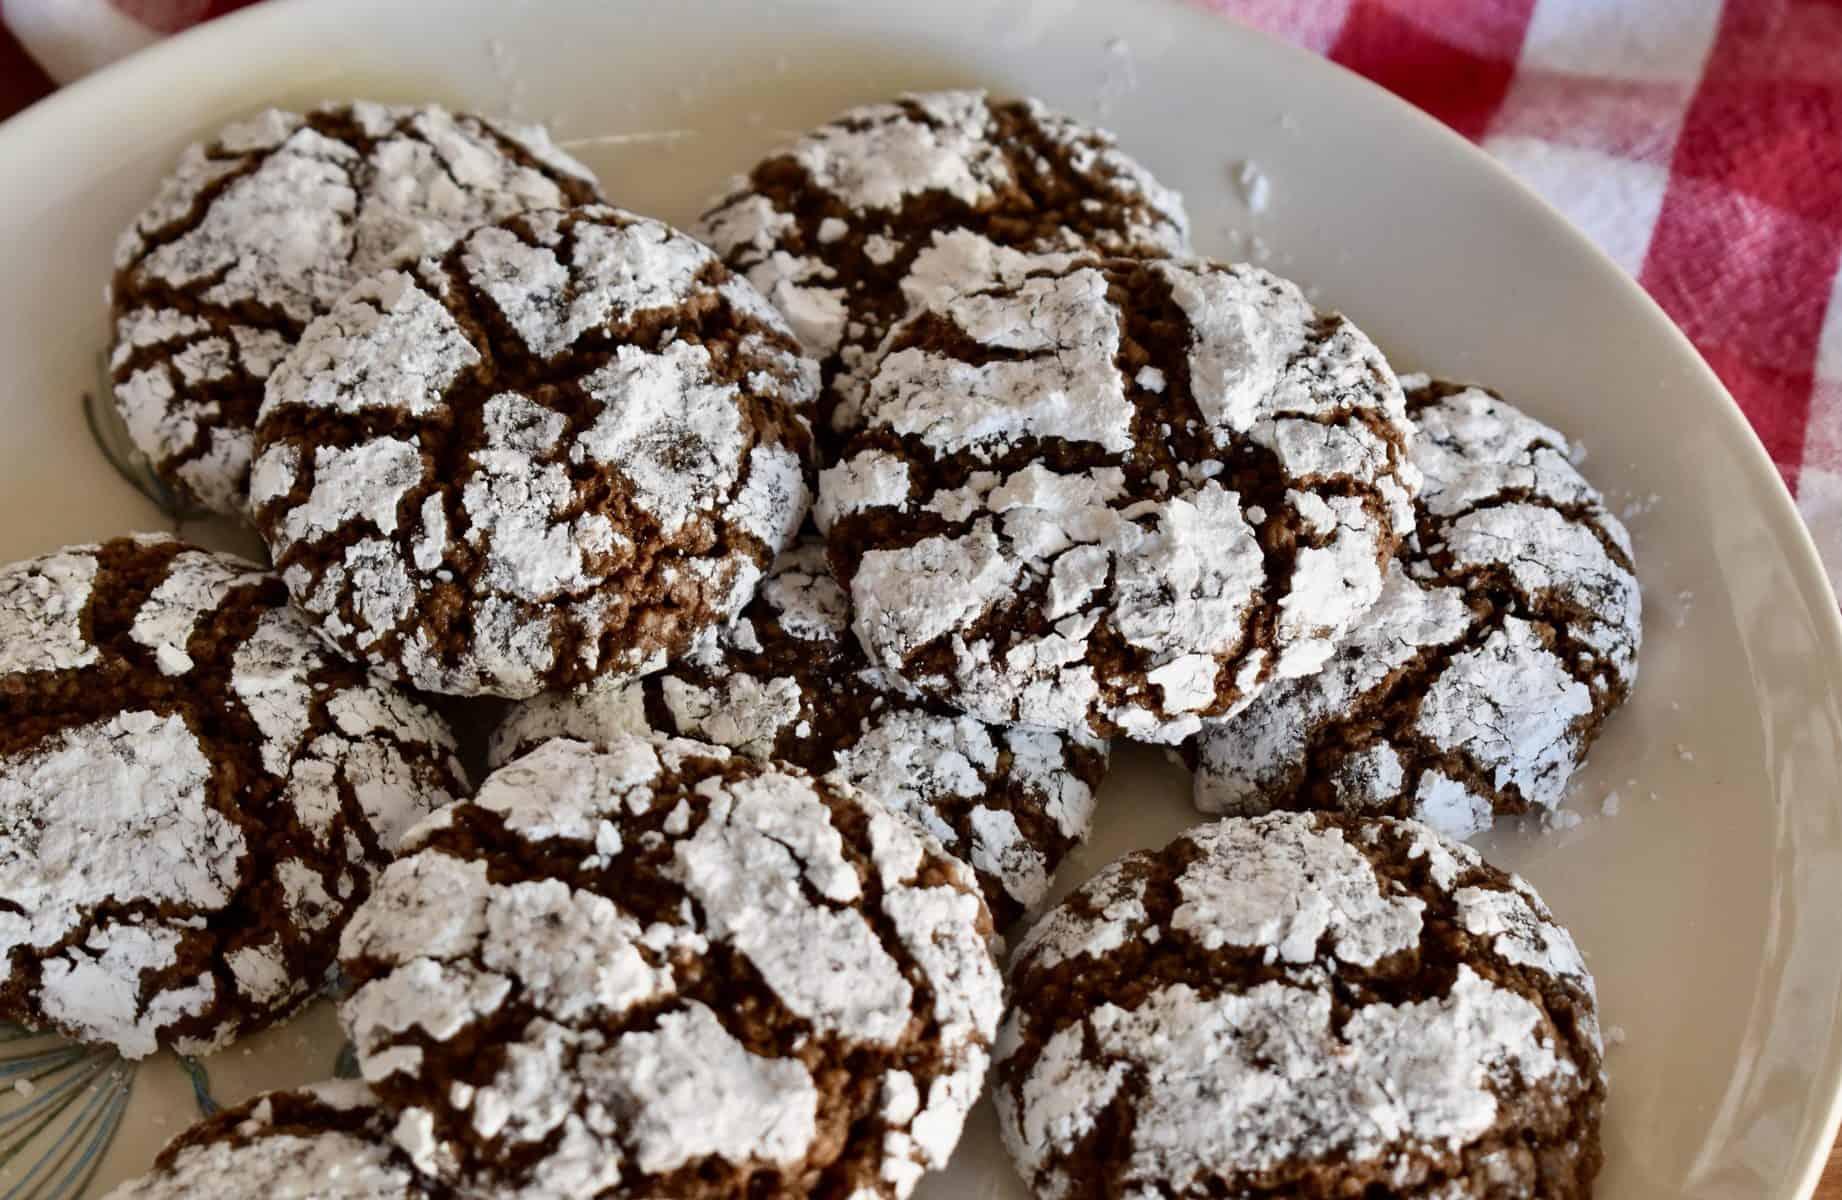 Plate full of Italian Almond Chocolate Cookies.